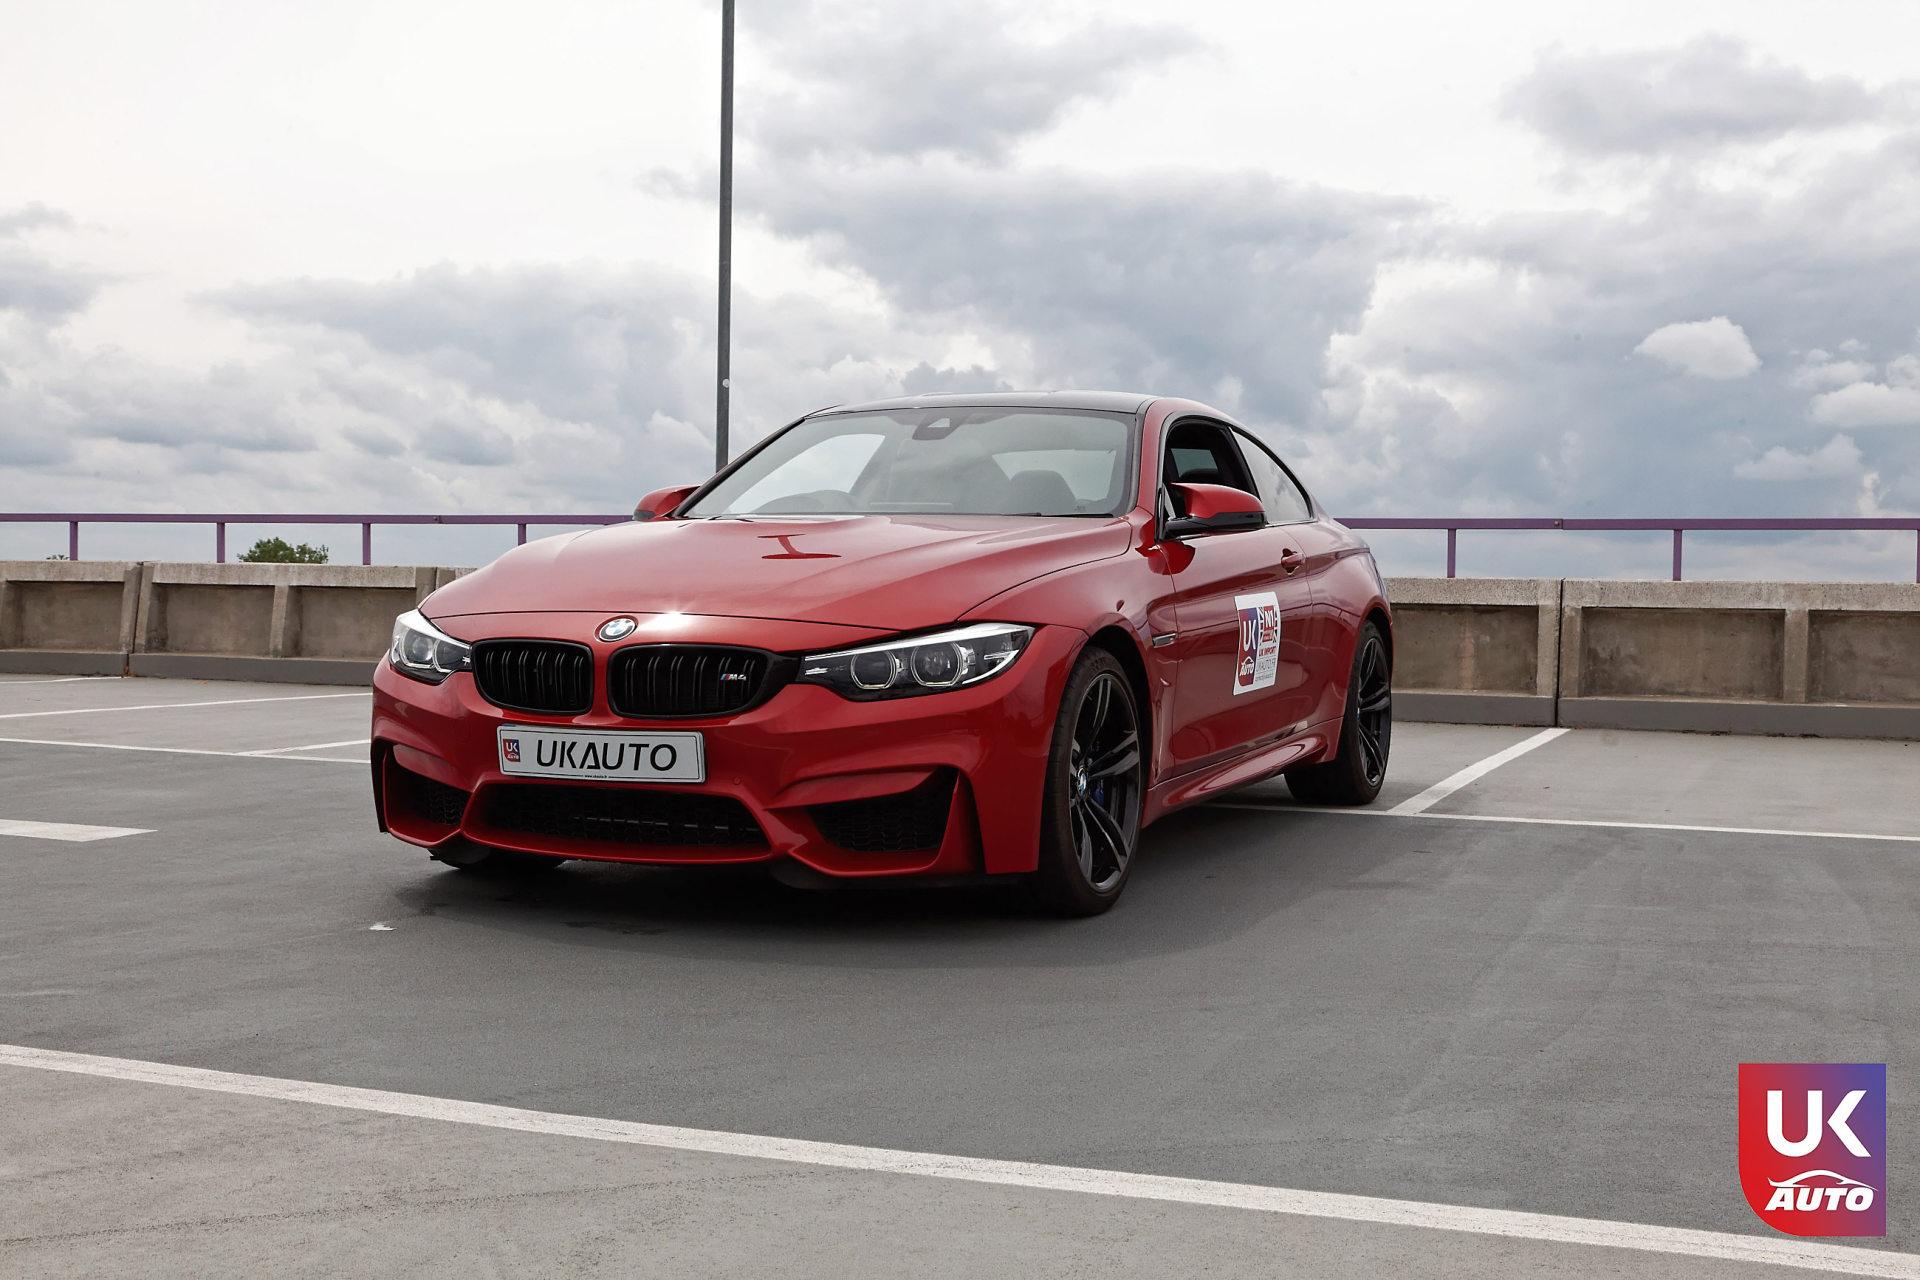 BMW M4 PACK COMPETITION BMW ANGLETERRE BMW IMPORT UK BMW MANDATAIRE AUTO4 DxO - IMPORTATION BMW M4 BMW IMPORT ROYAUME UNI BMW M4 COMPETITION RHD CLIENT UKAUTO